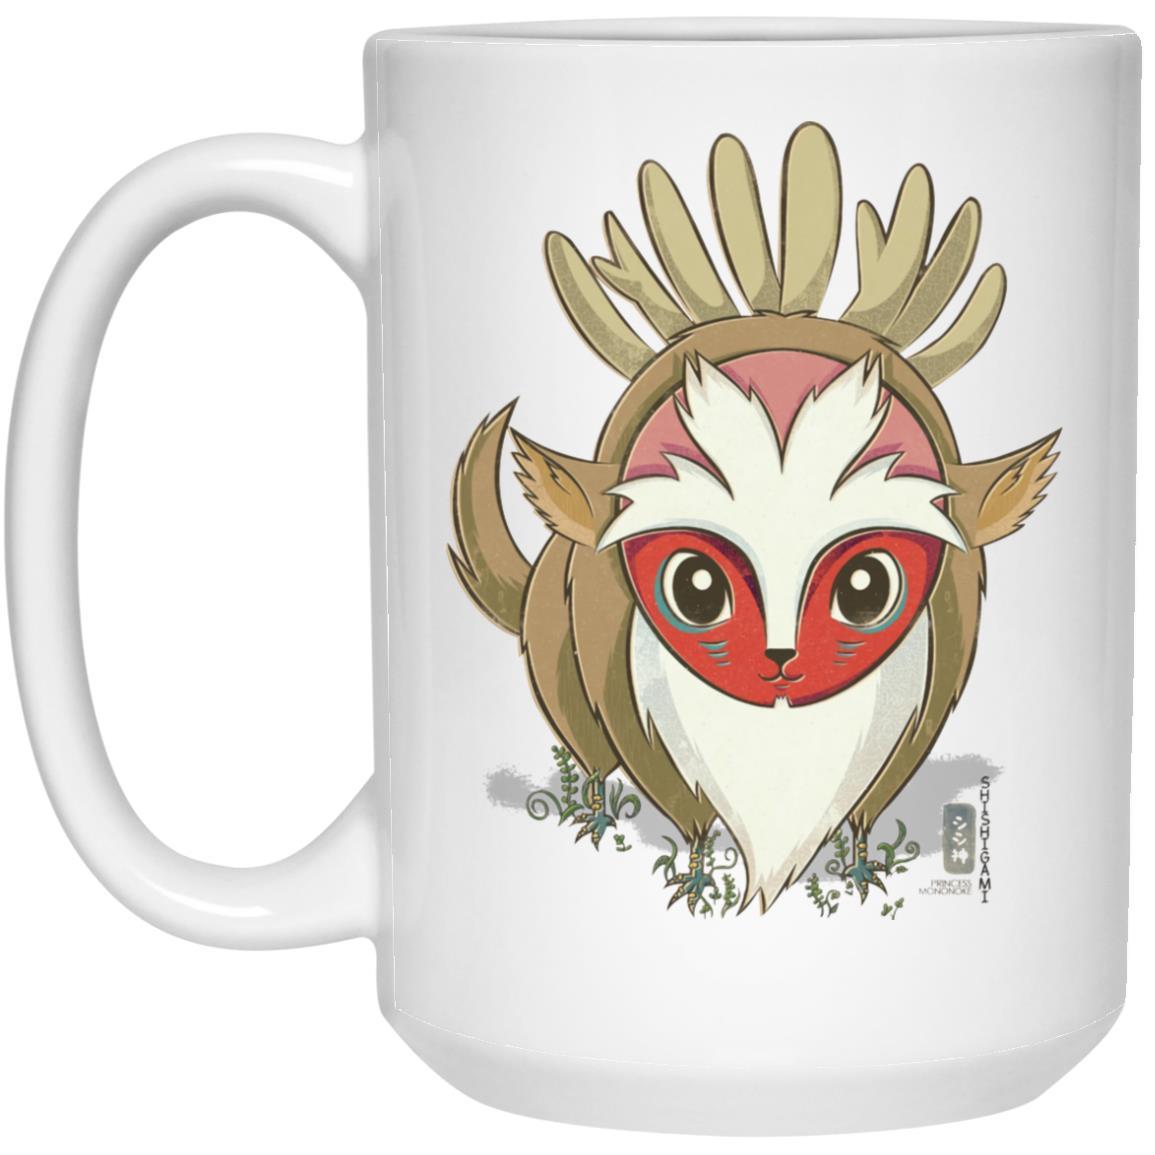 Princess Mononoke – Forest Spirit Chibi Mug